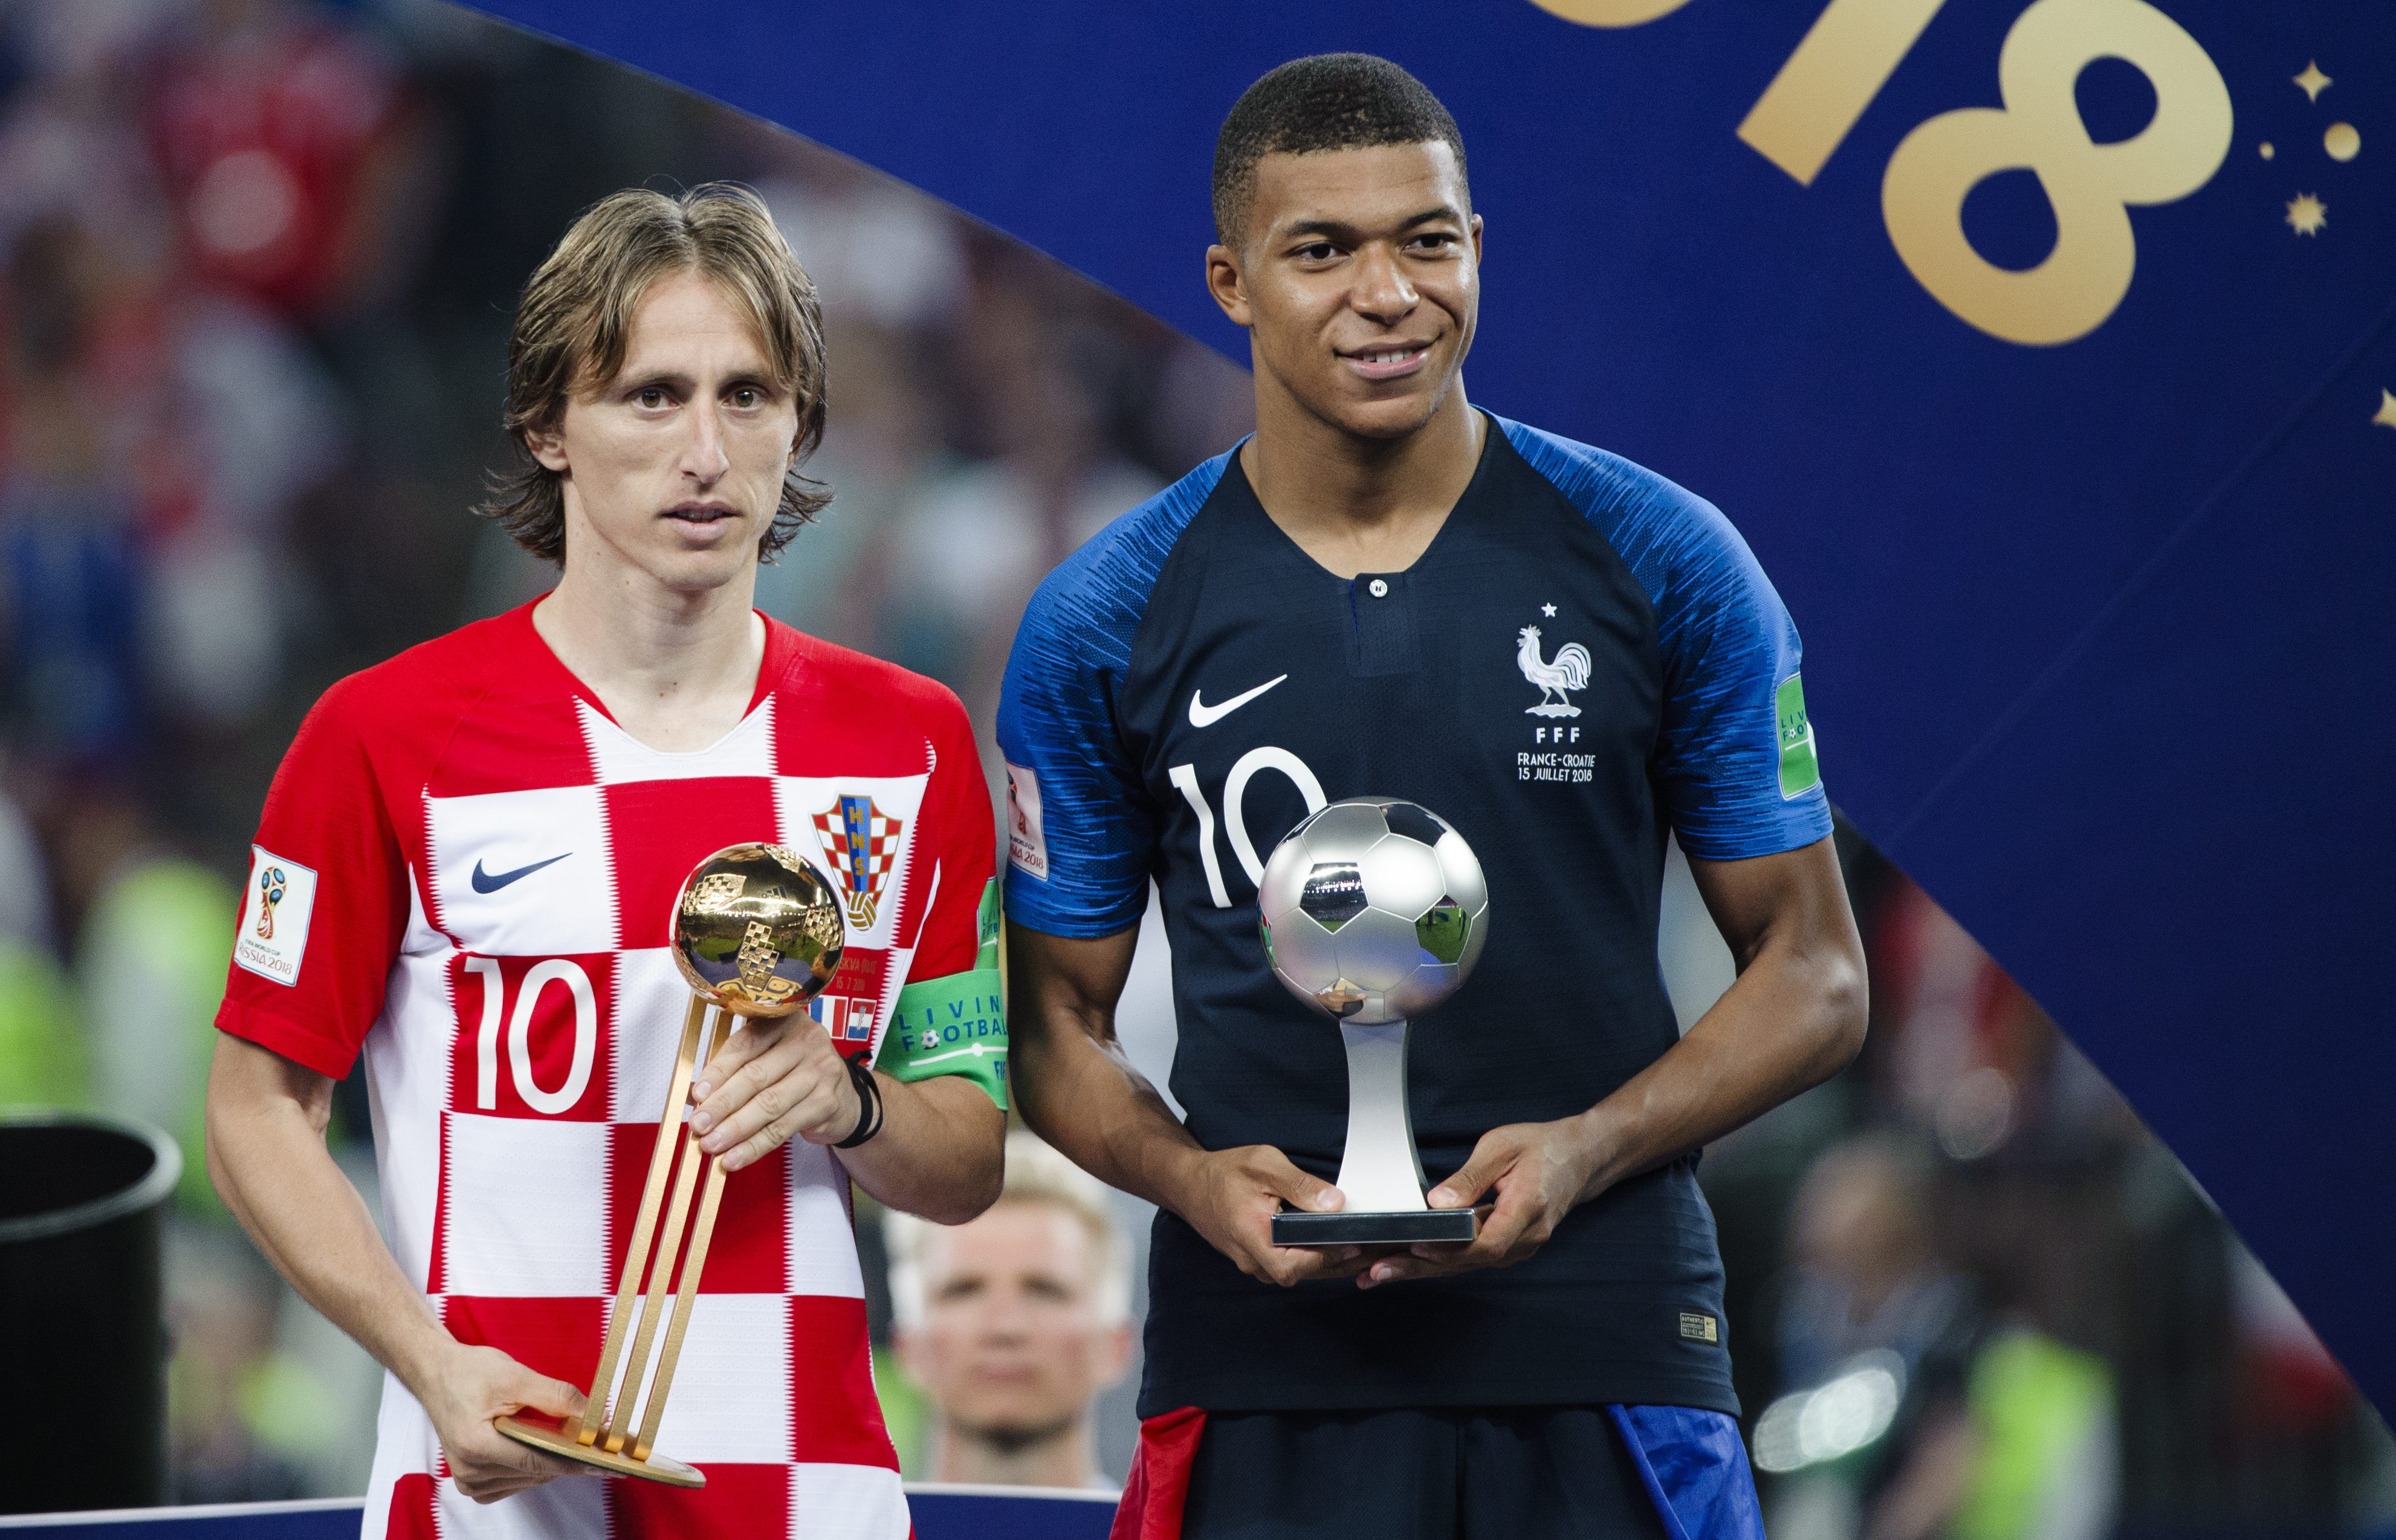 Luka Modric, Soccer, Trophy, FIFA